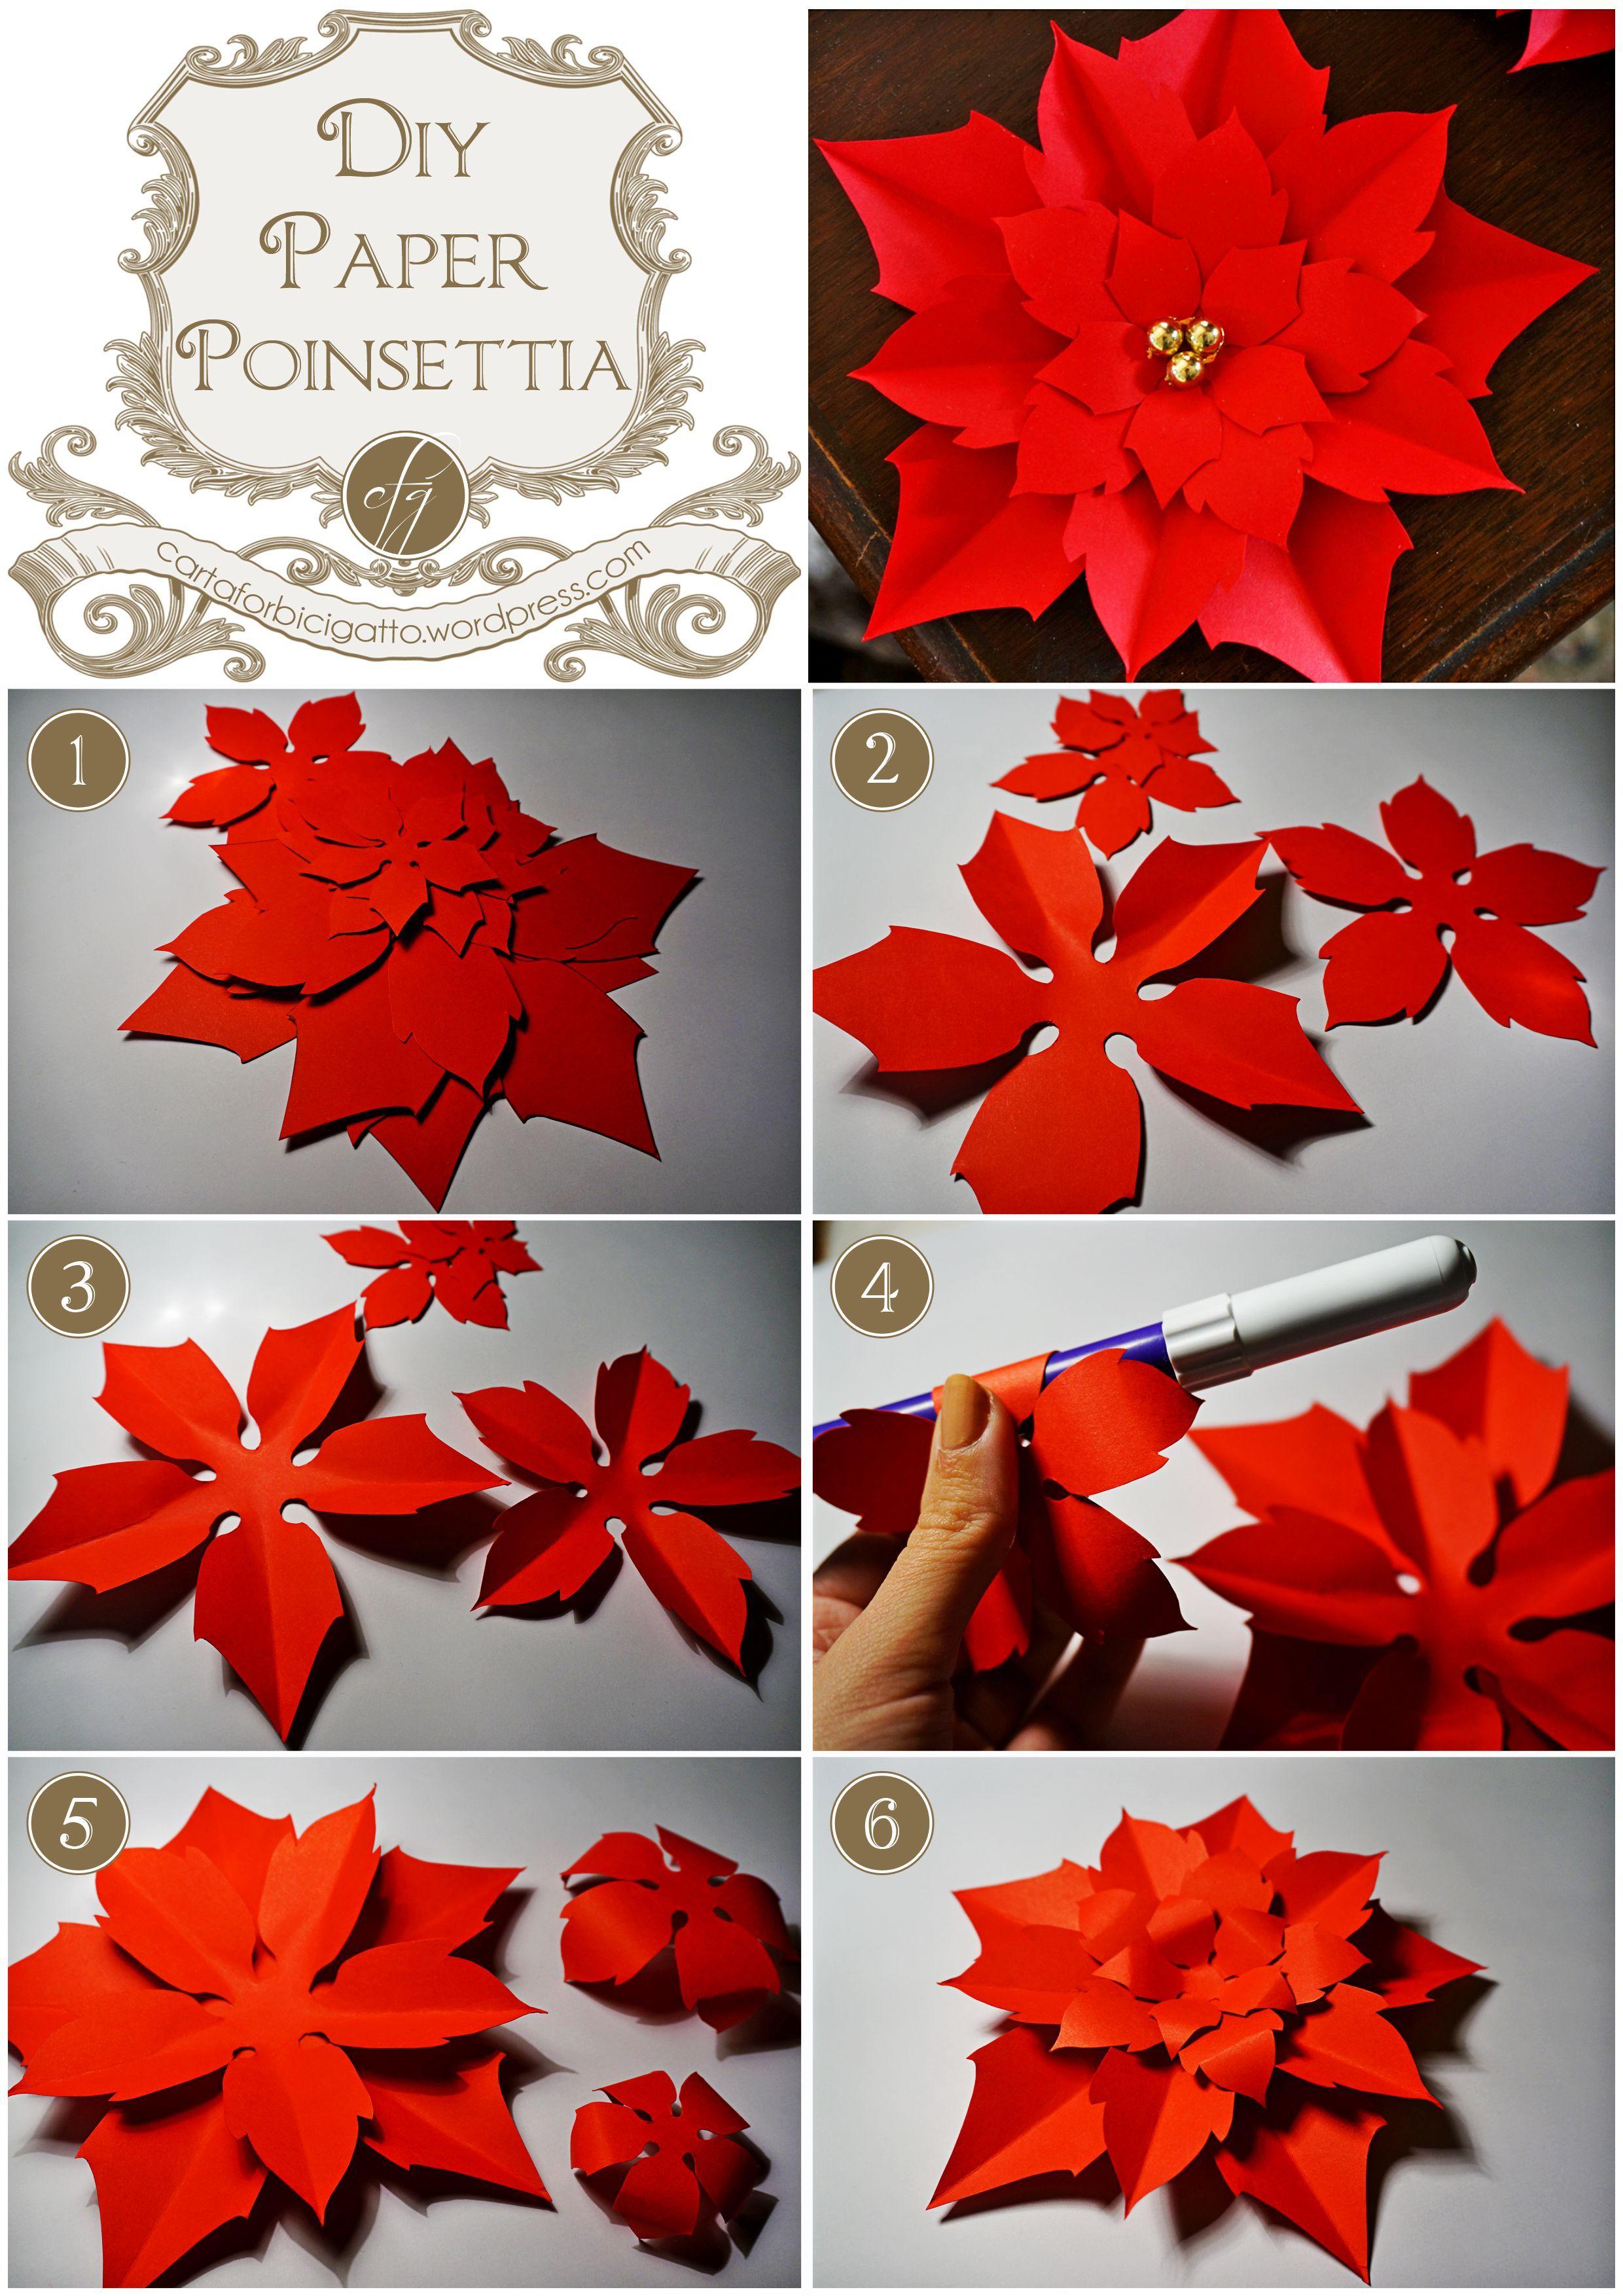 Diy Paper Poinsettiacfg Diy Paper Poinsettia And Flowers